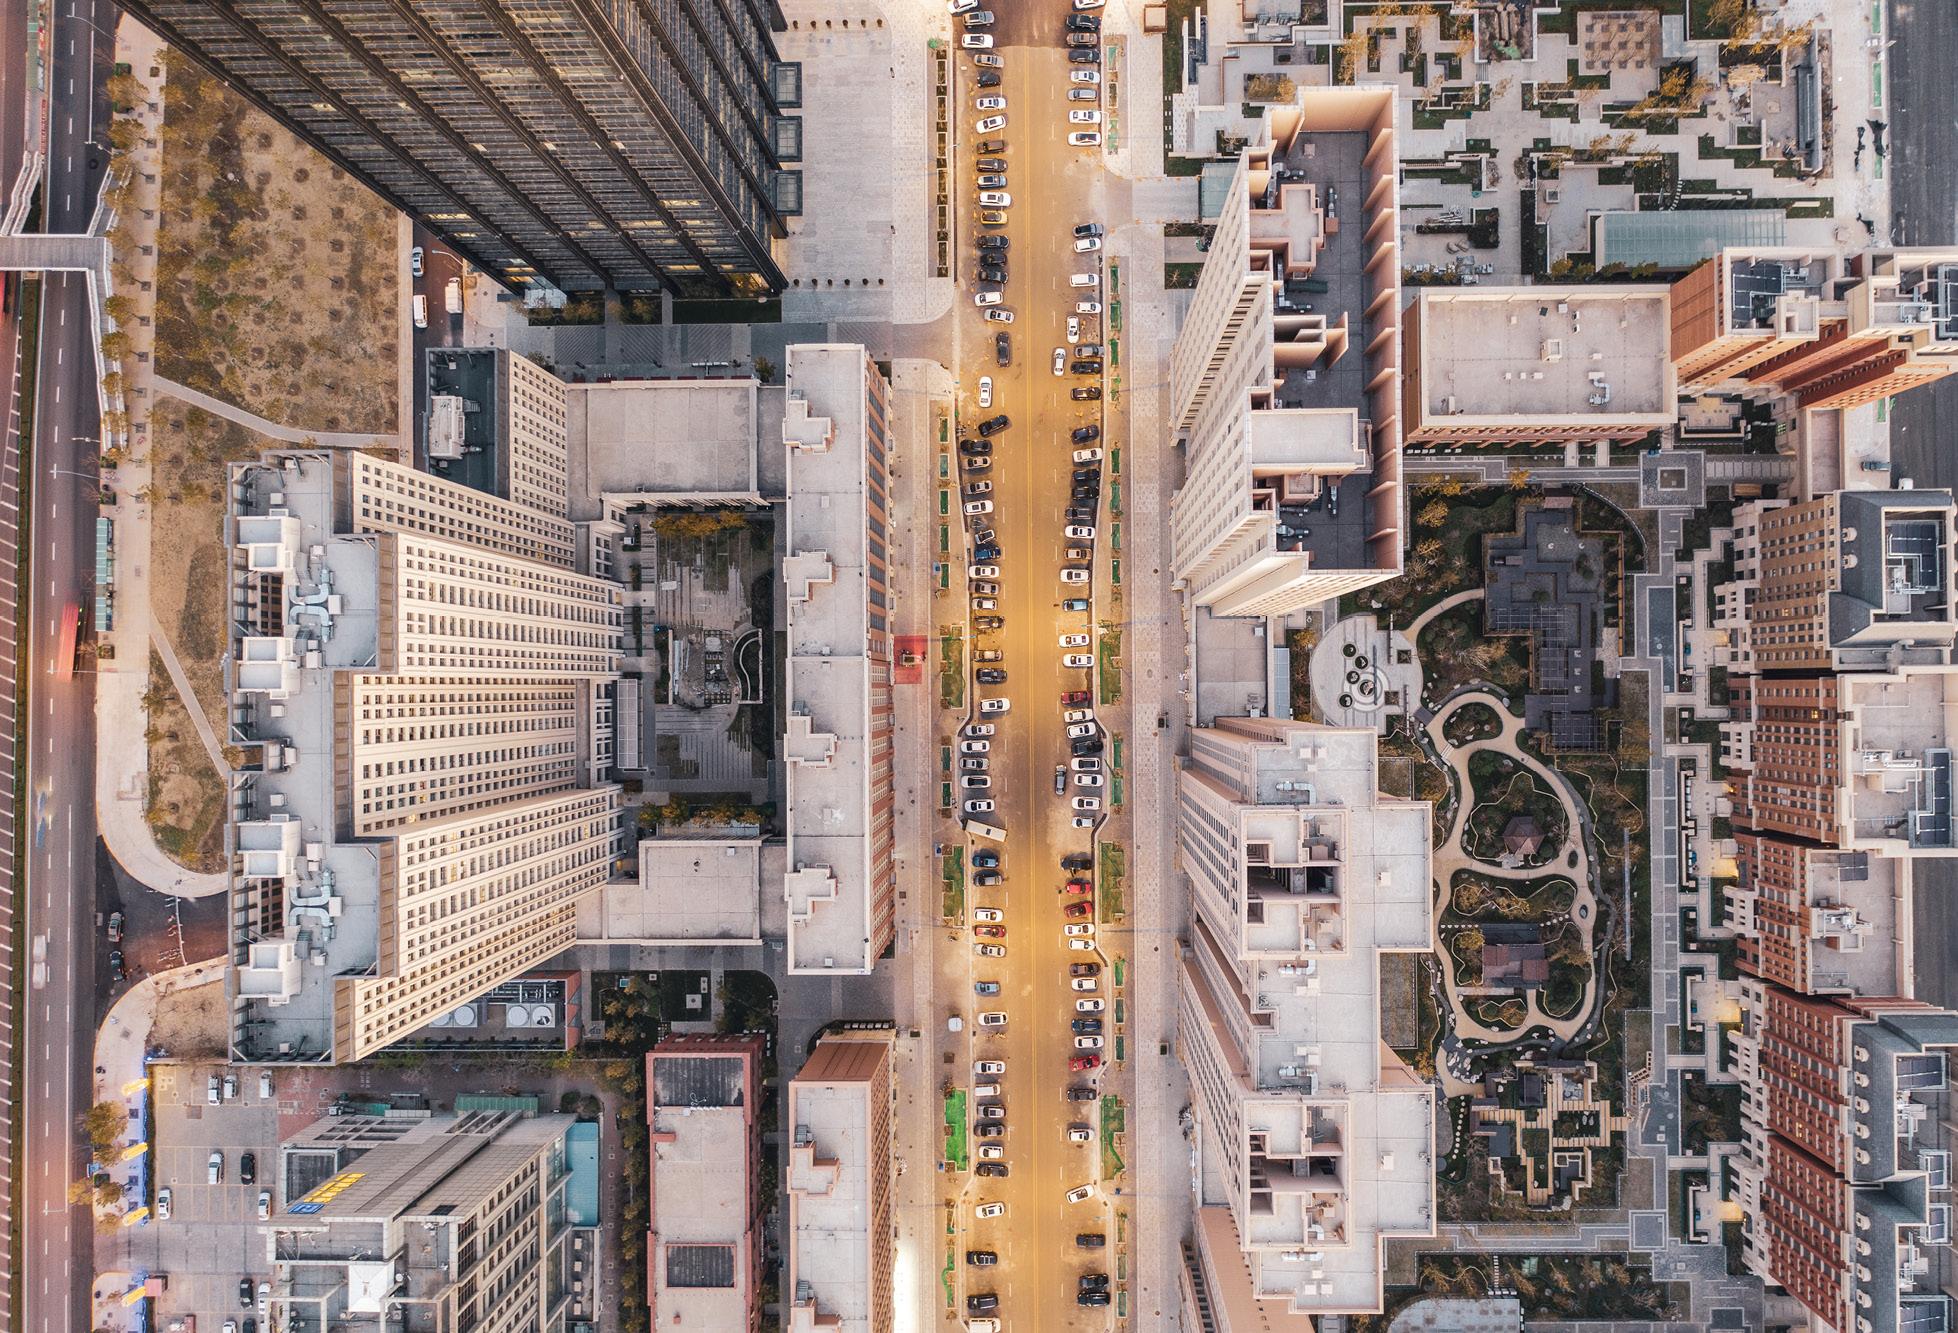 aerial buildings, property, real estate